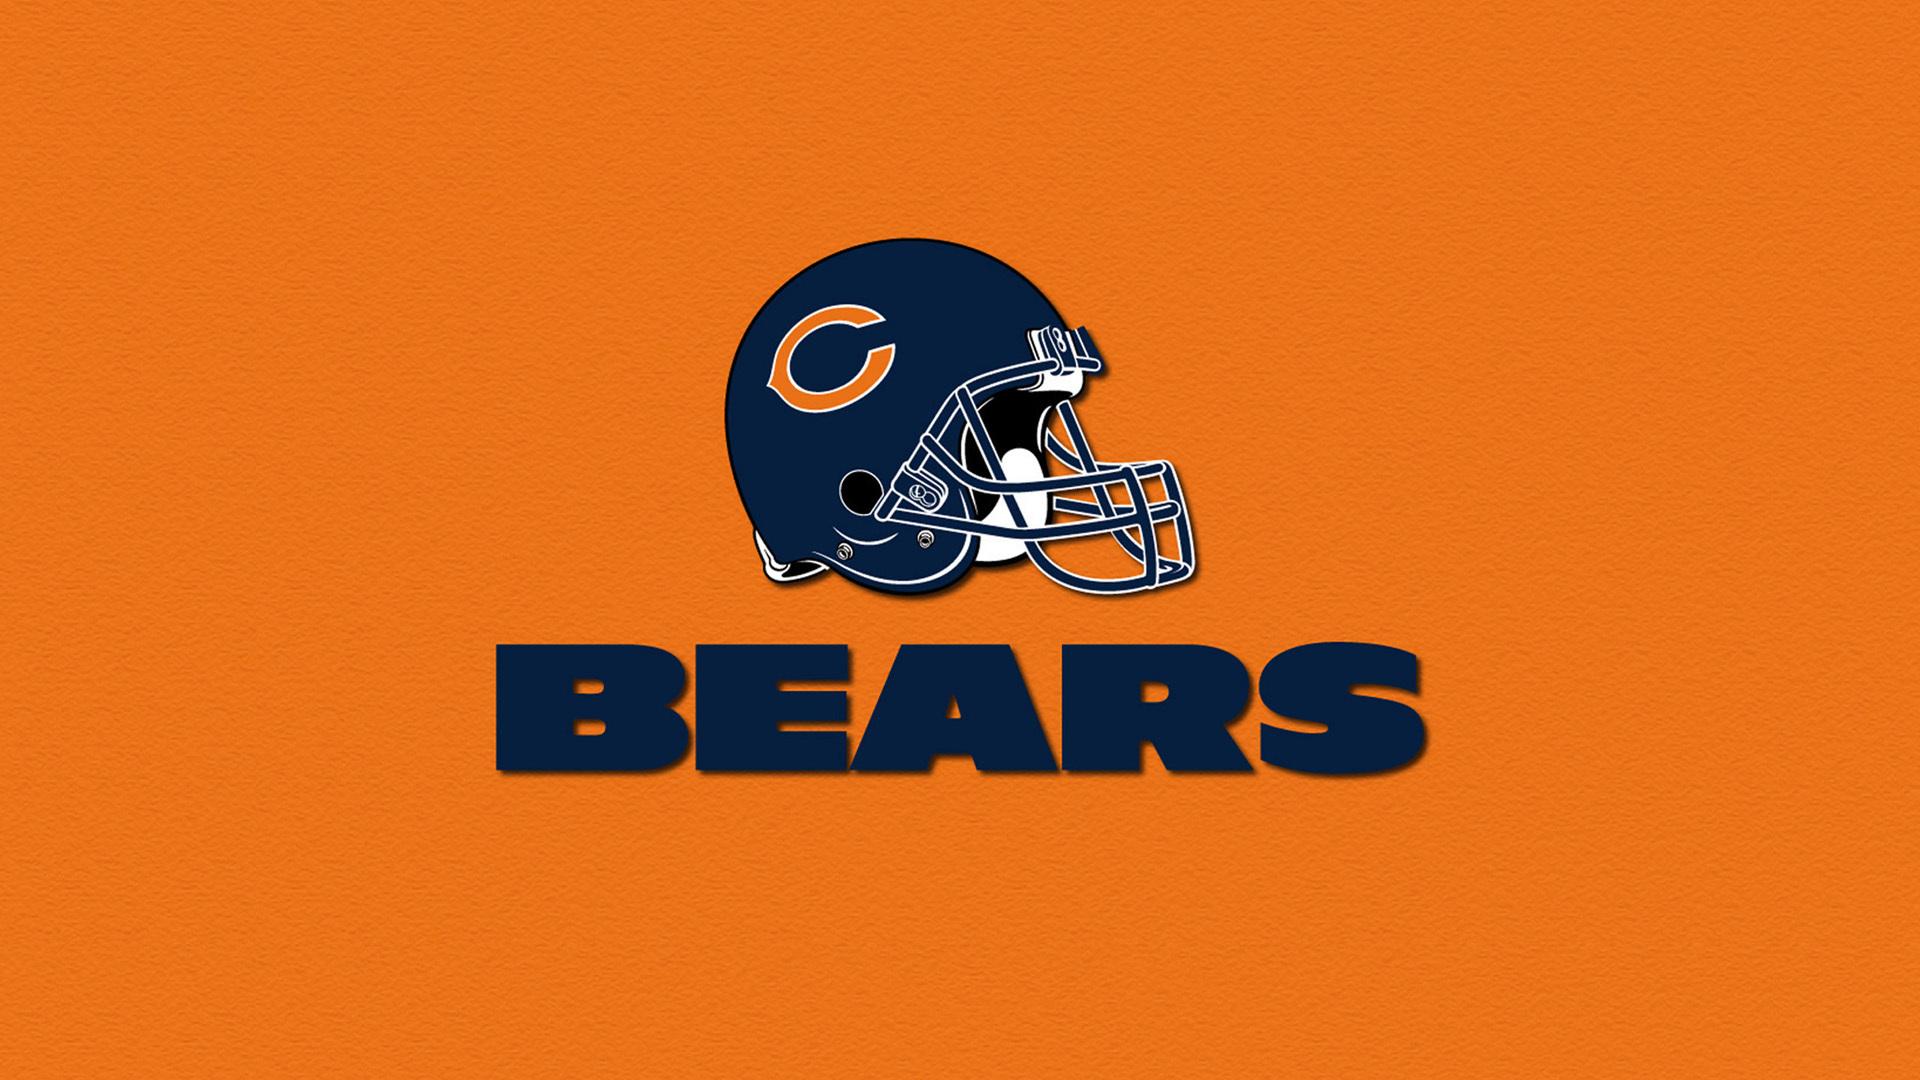 Chicago Bears Widescreen